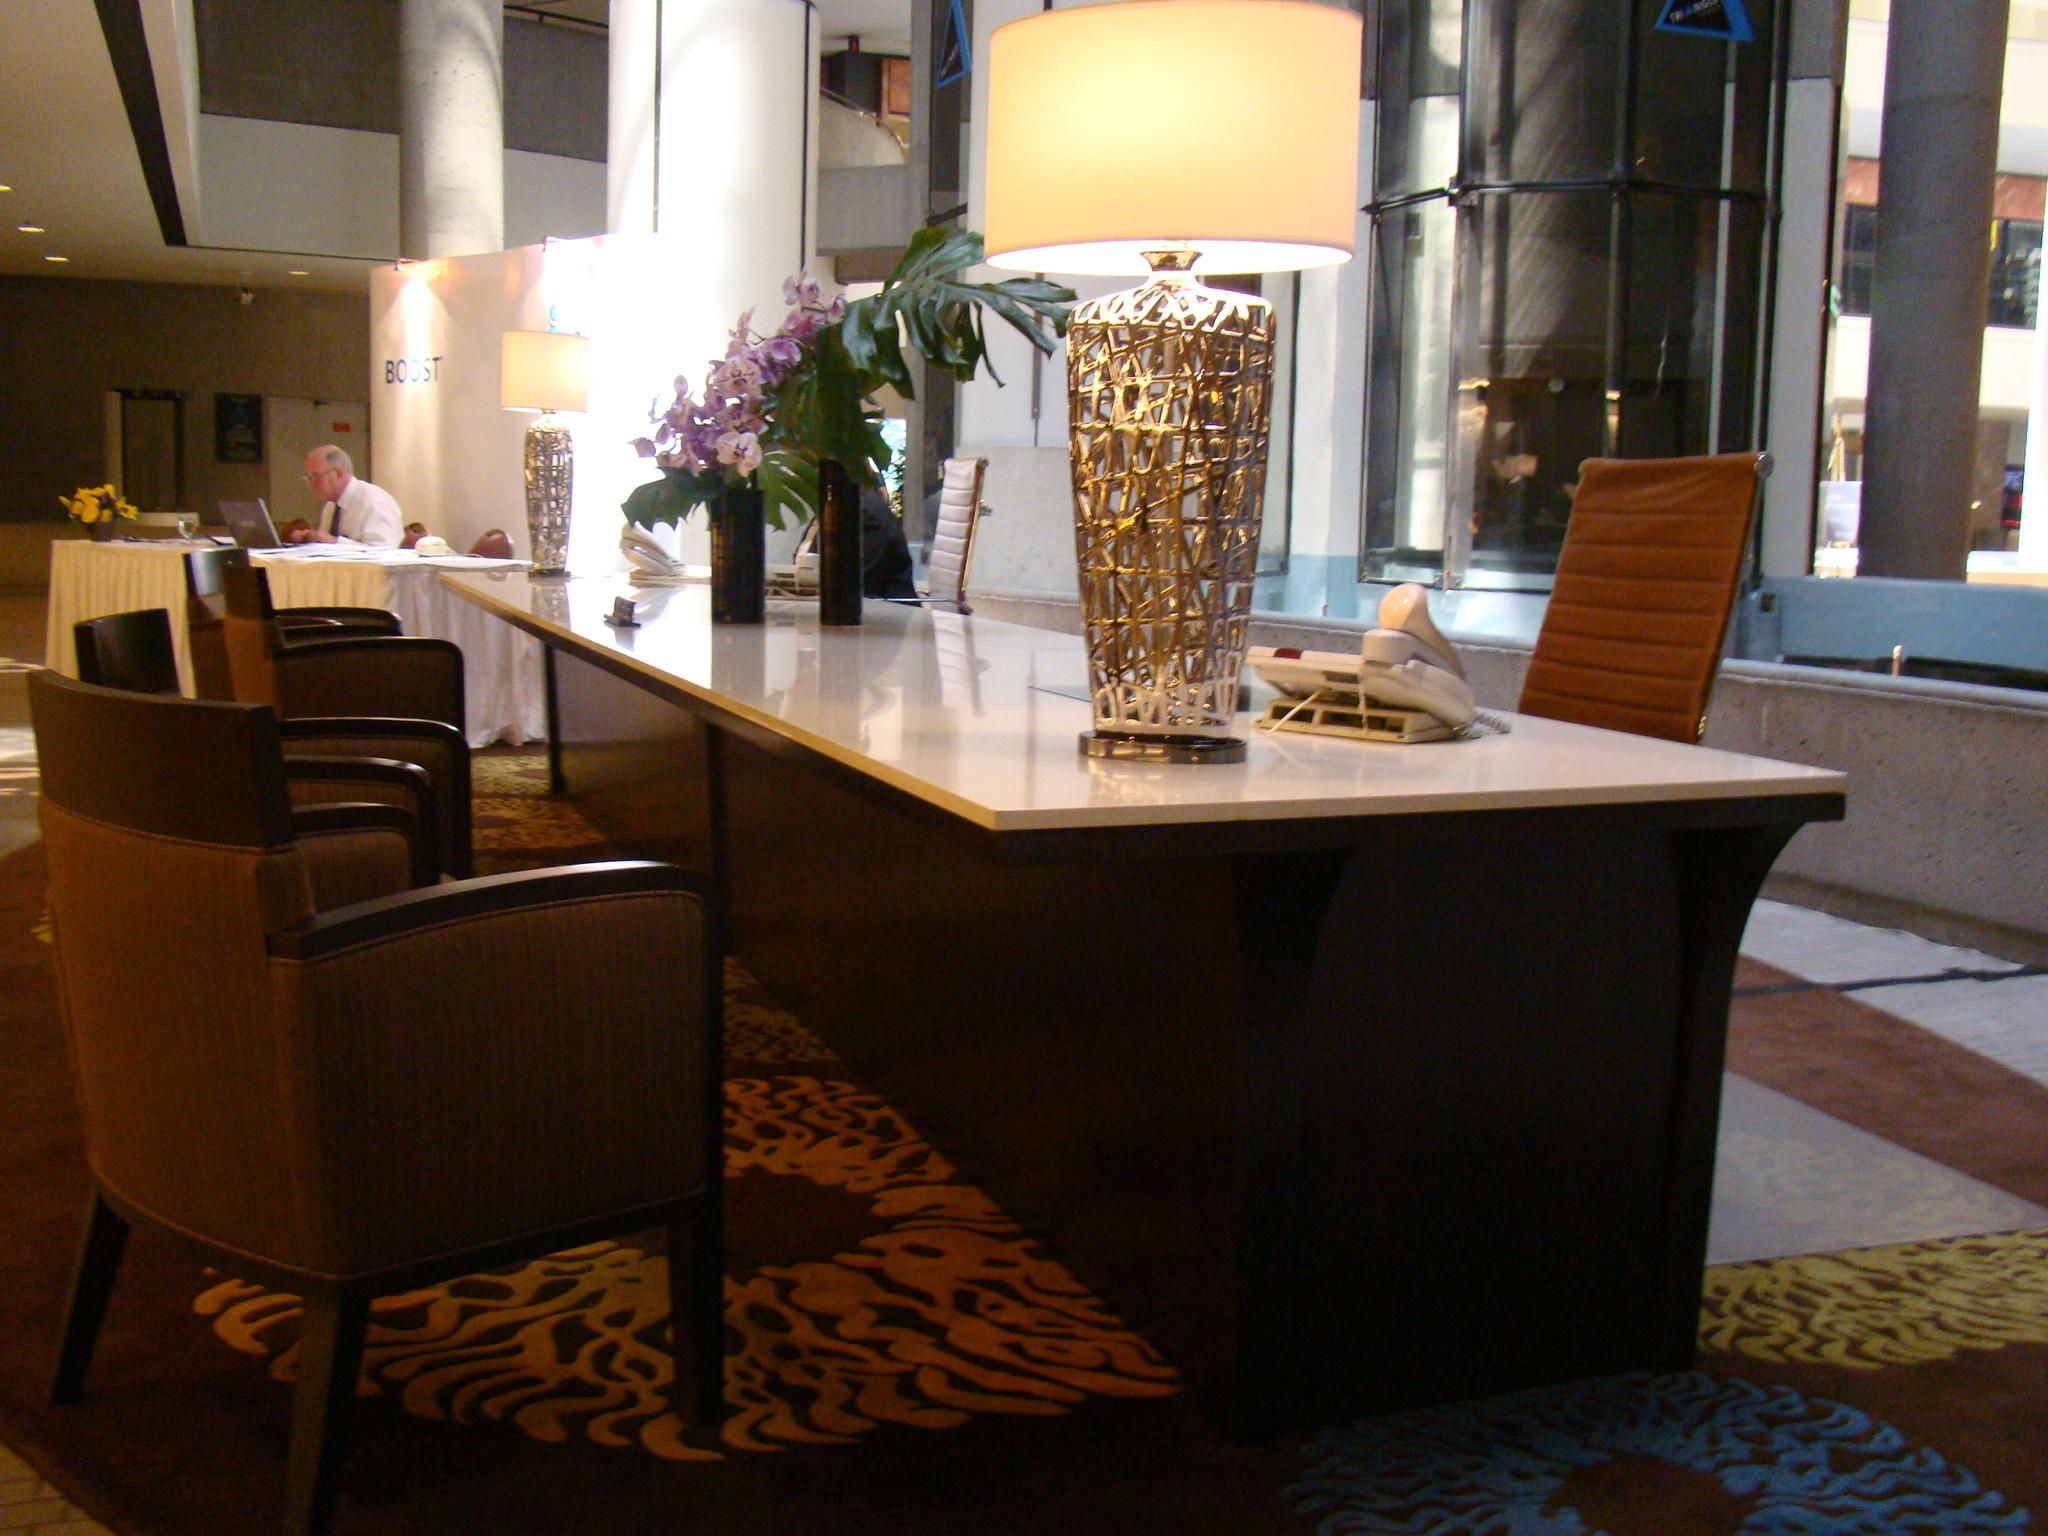 Concierge Desk in Hotel Lobby  Juhasz Furniture Design